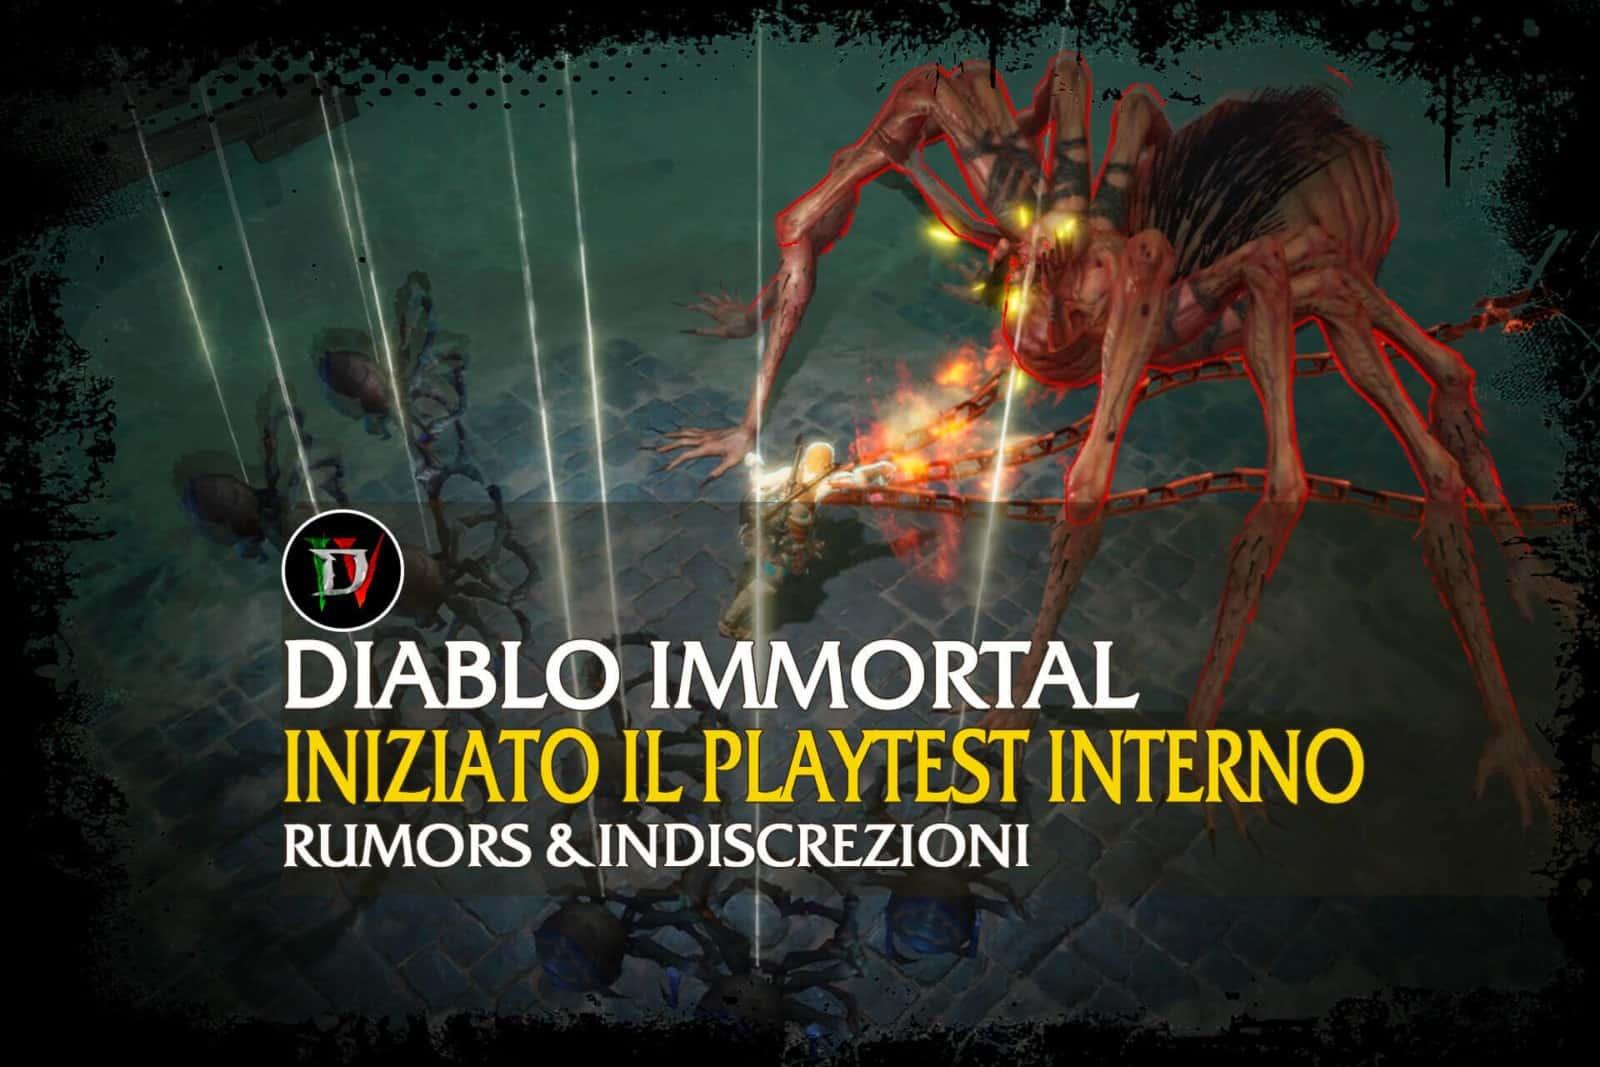 diablo immortal playtest interno